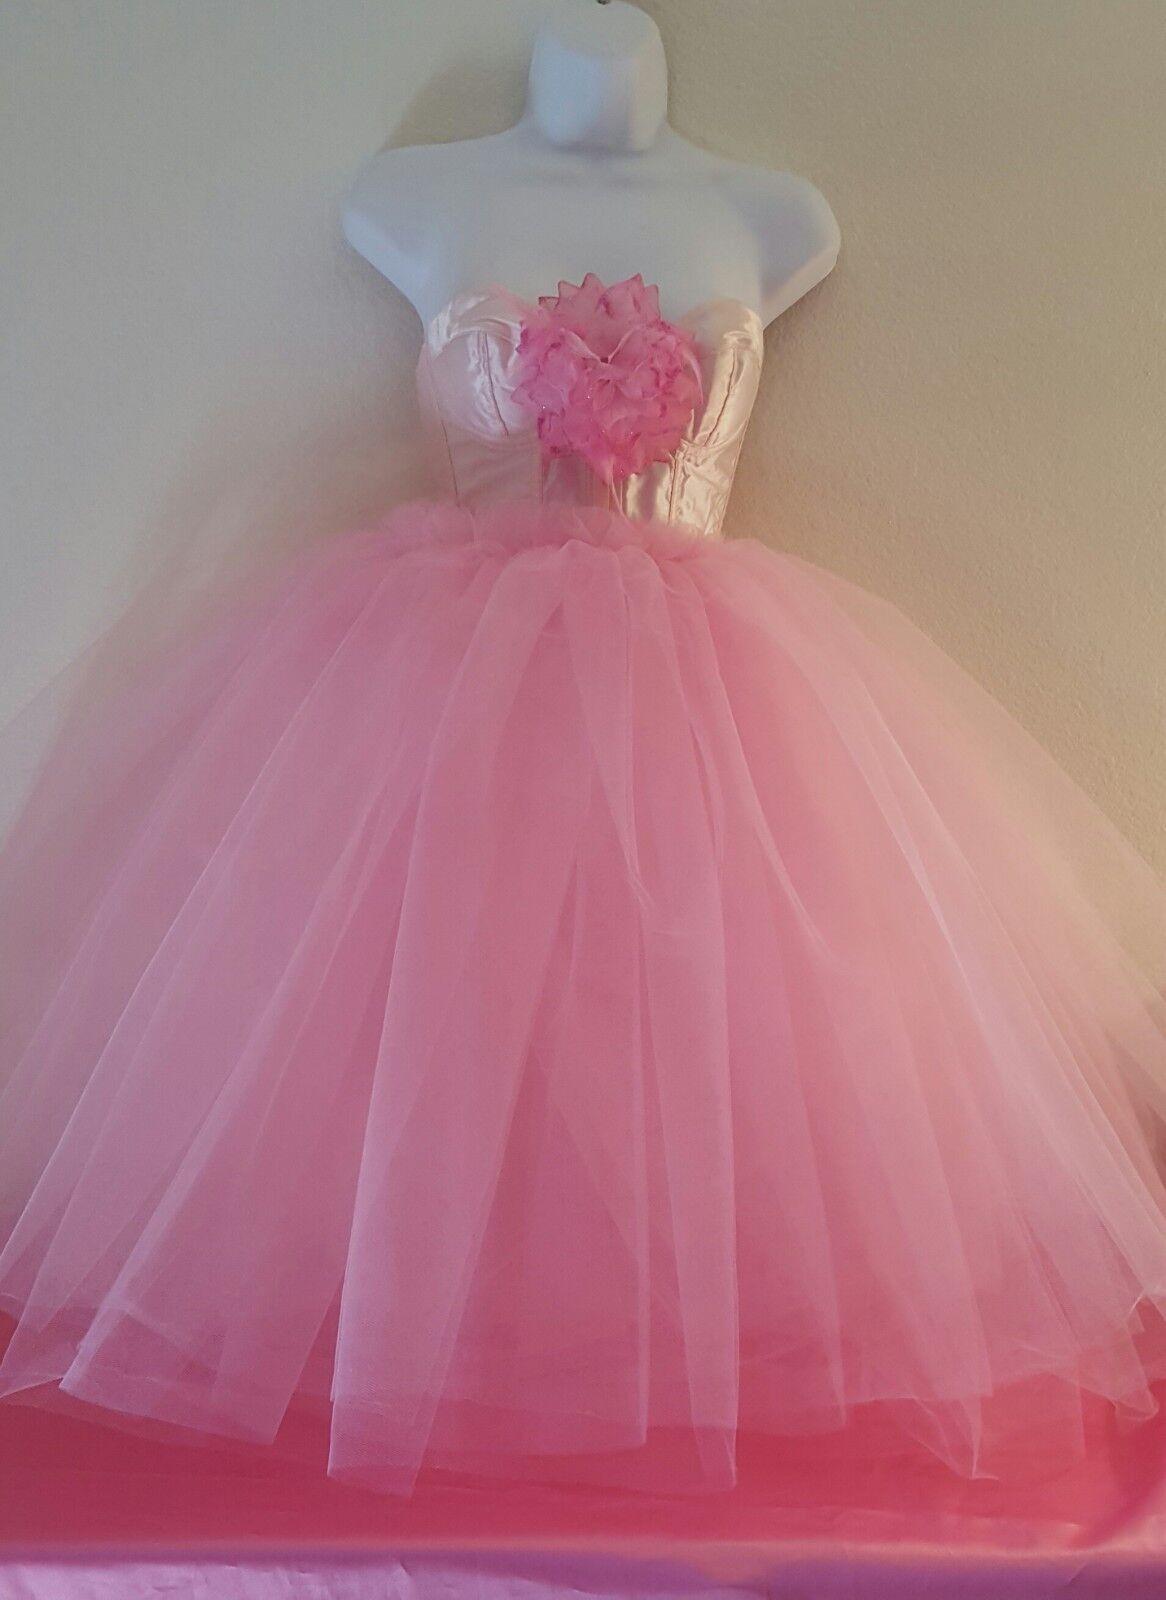 SEXY PASTEL PINK PRINCESS TULLE TUTU CORSET MINI DRESS BRIDAL WEDDING PROM PARTY